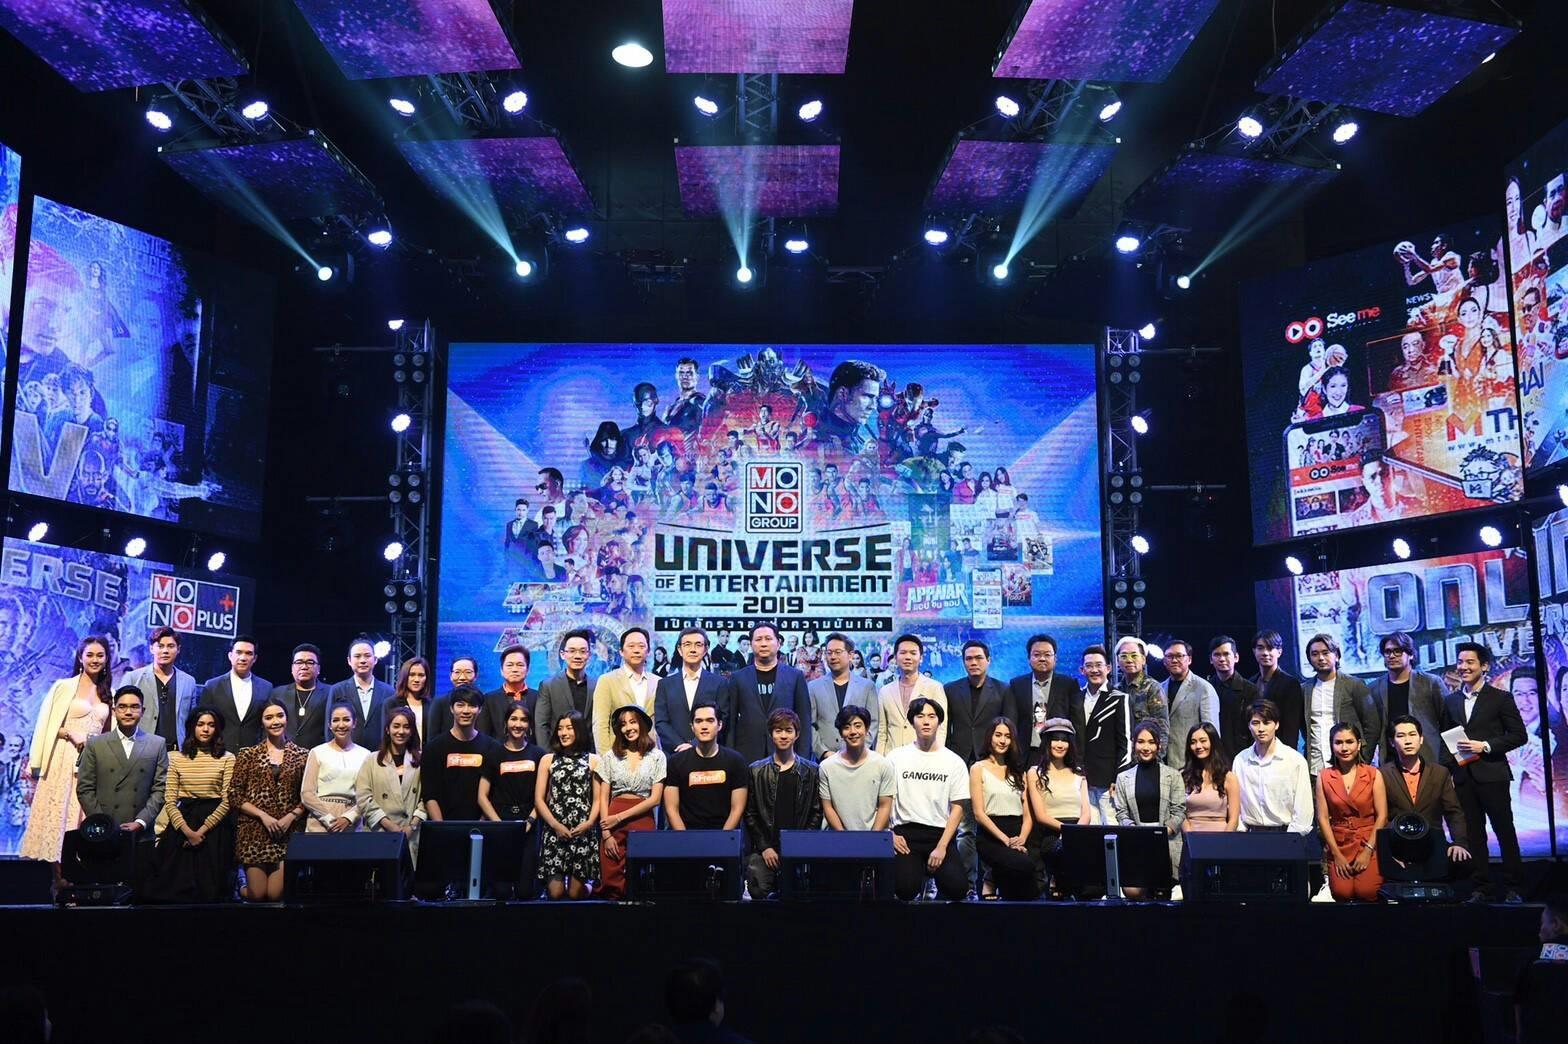 MONO GROUP: UNIVERSE OF ENTERTAINMENT